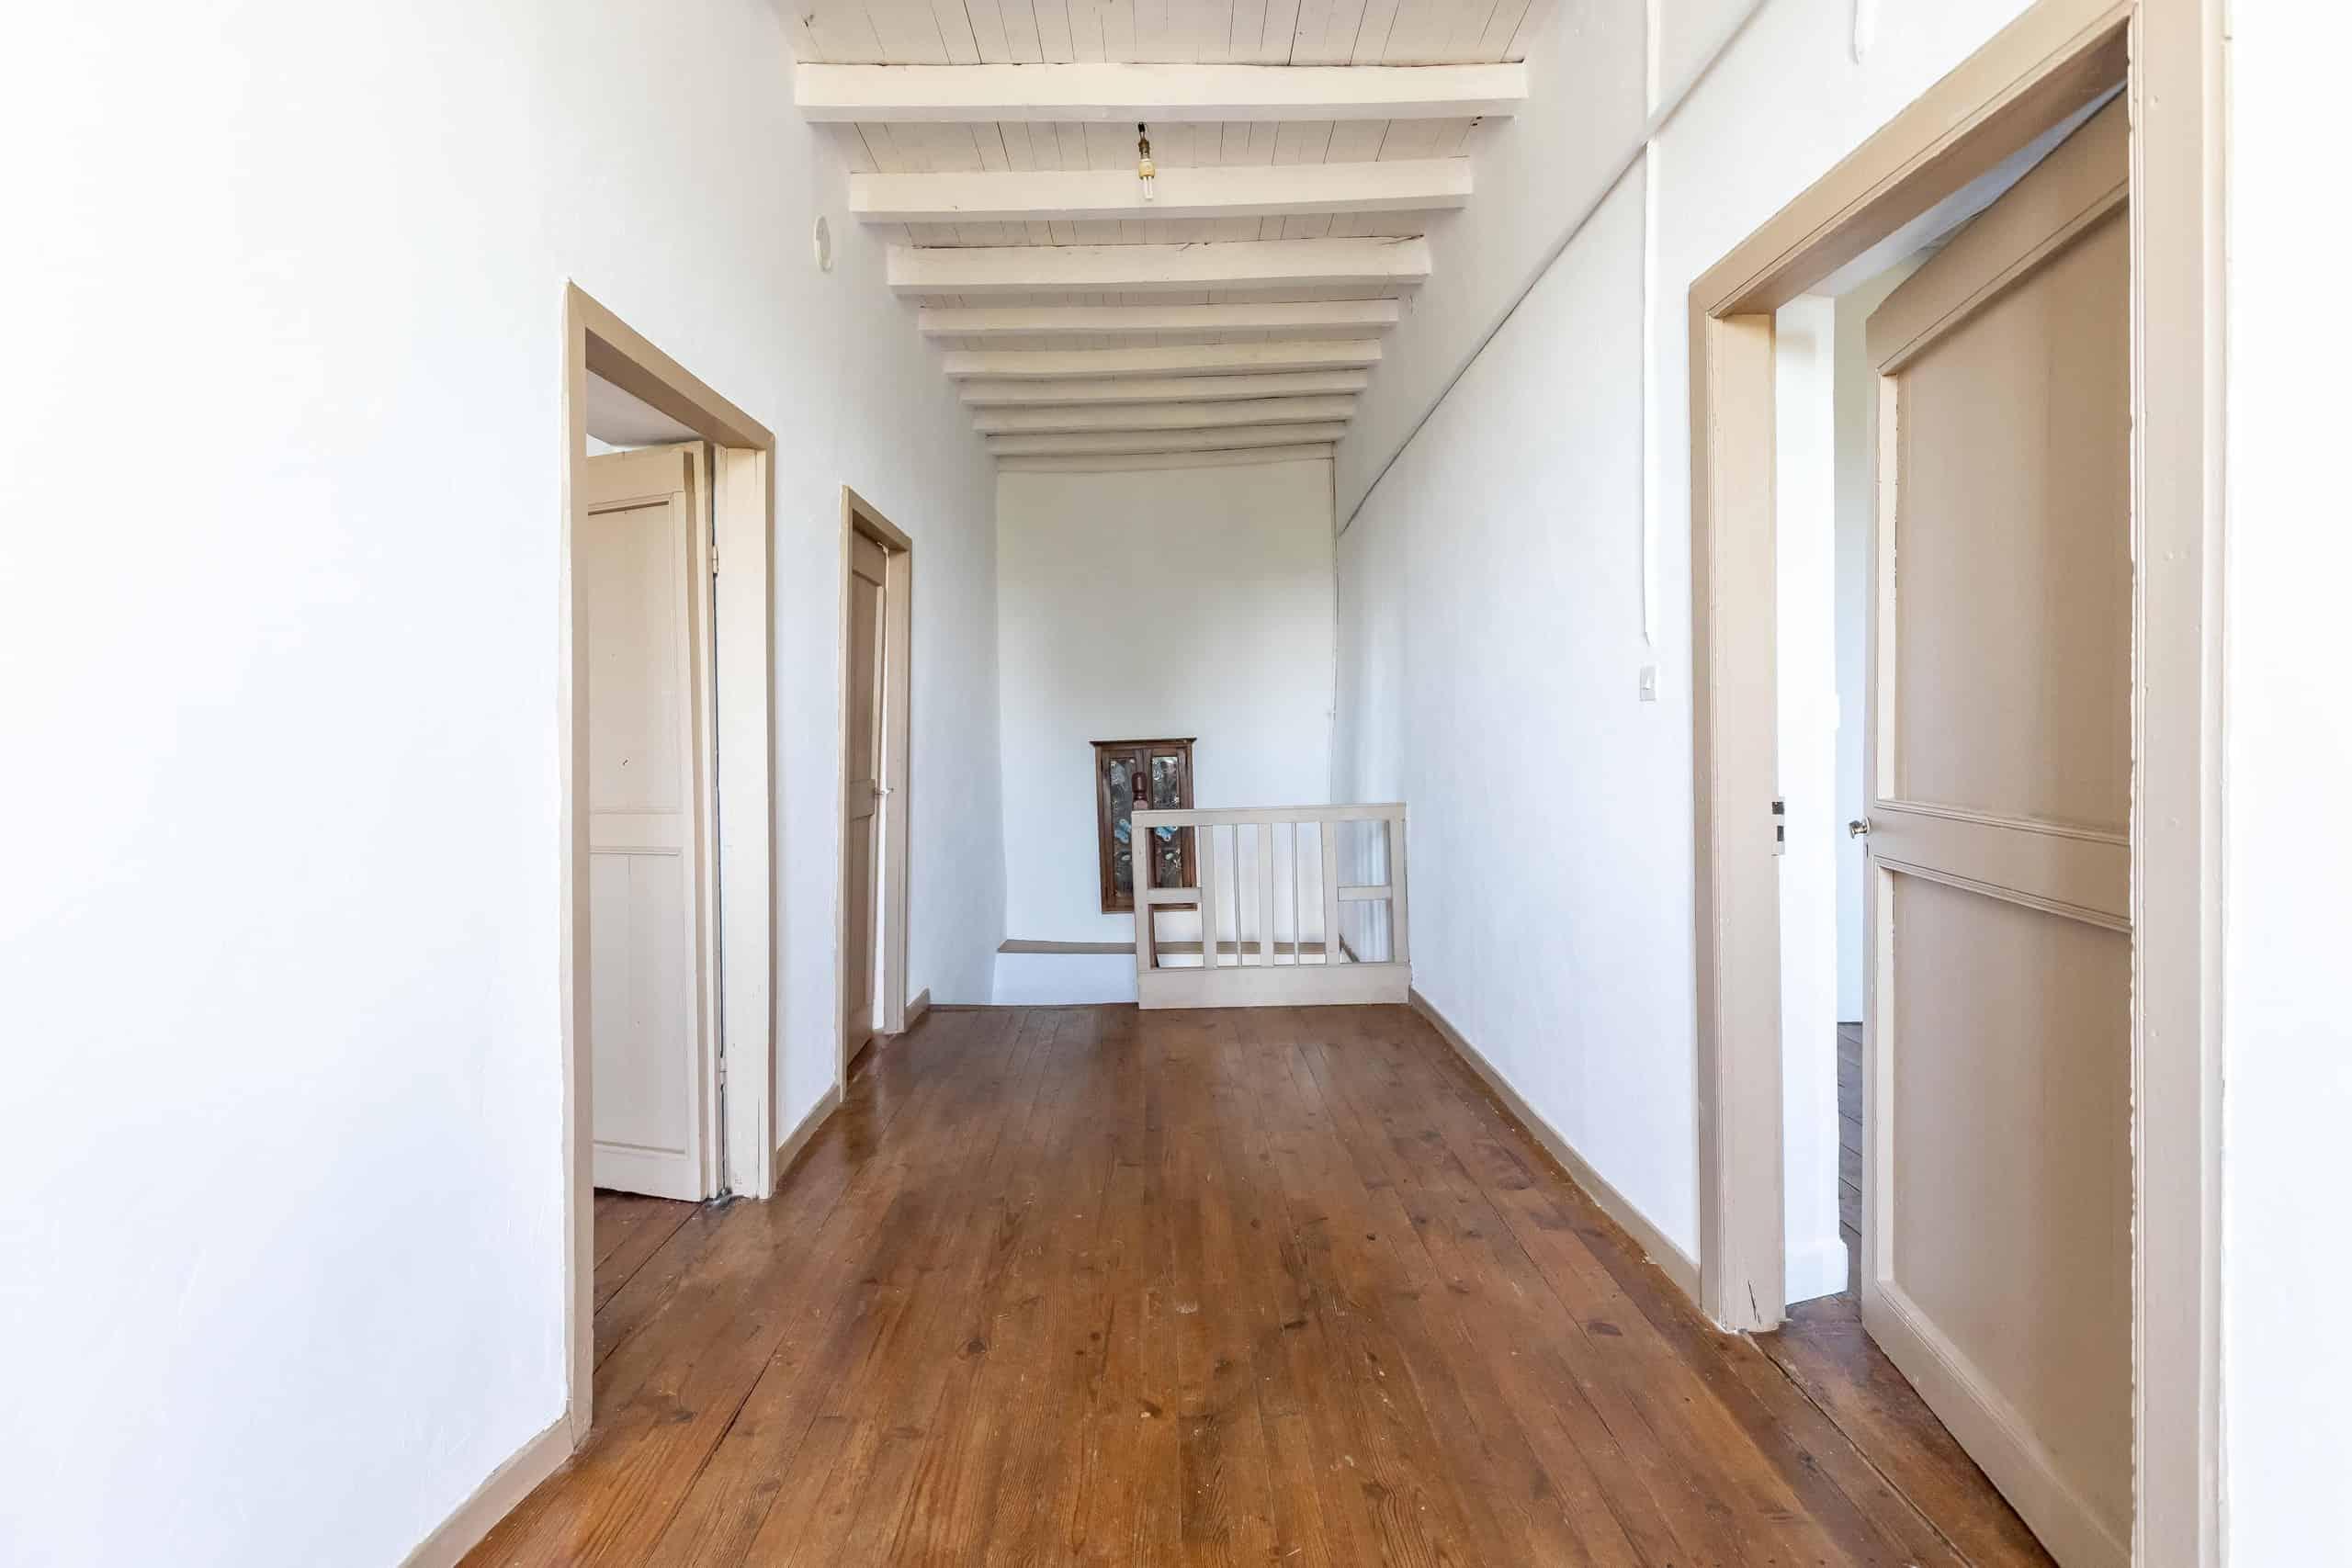 Hallway-WMC070